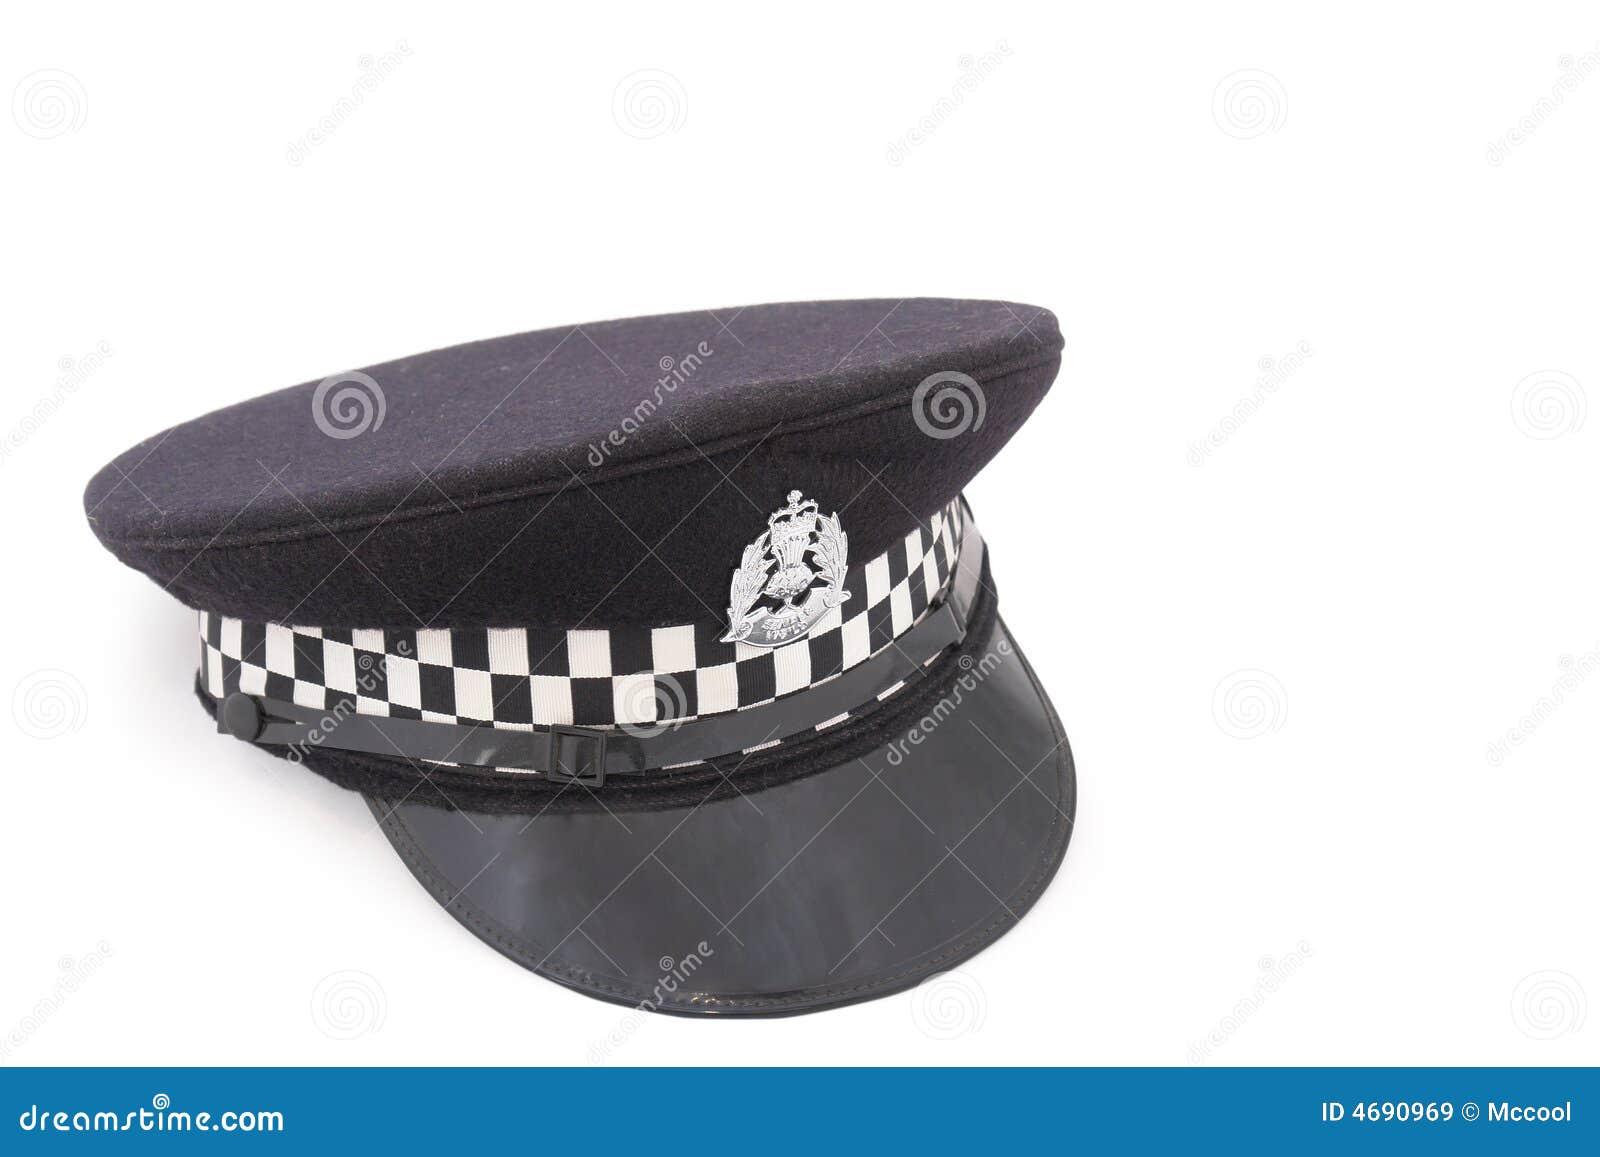 Hat of British police officer